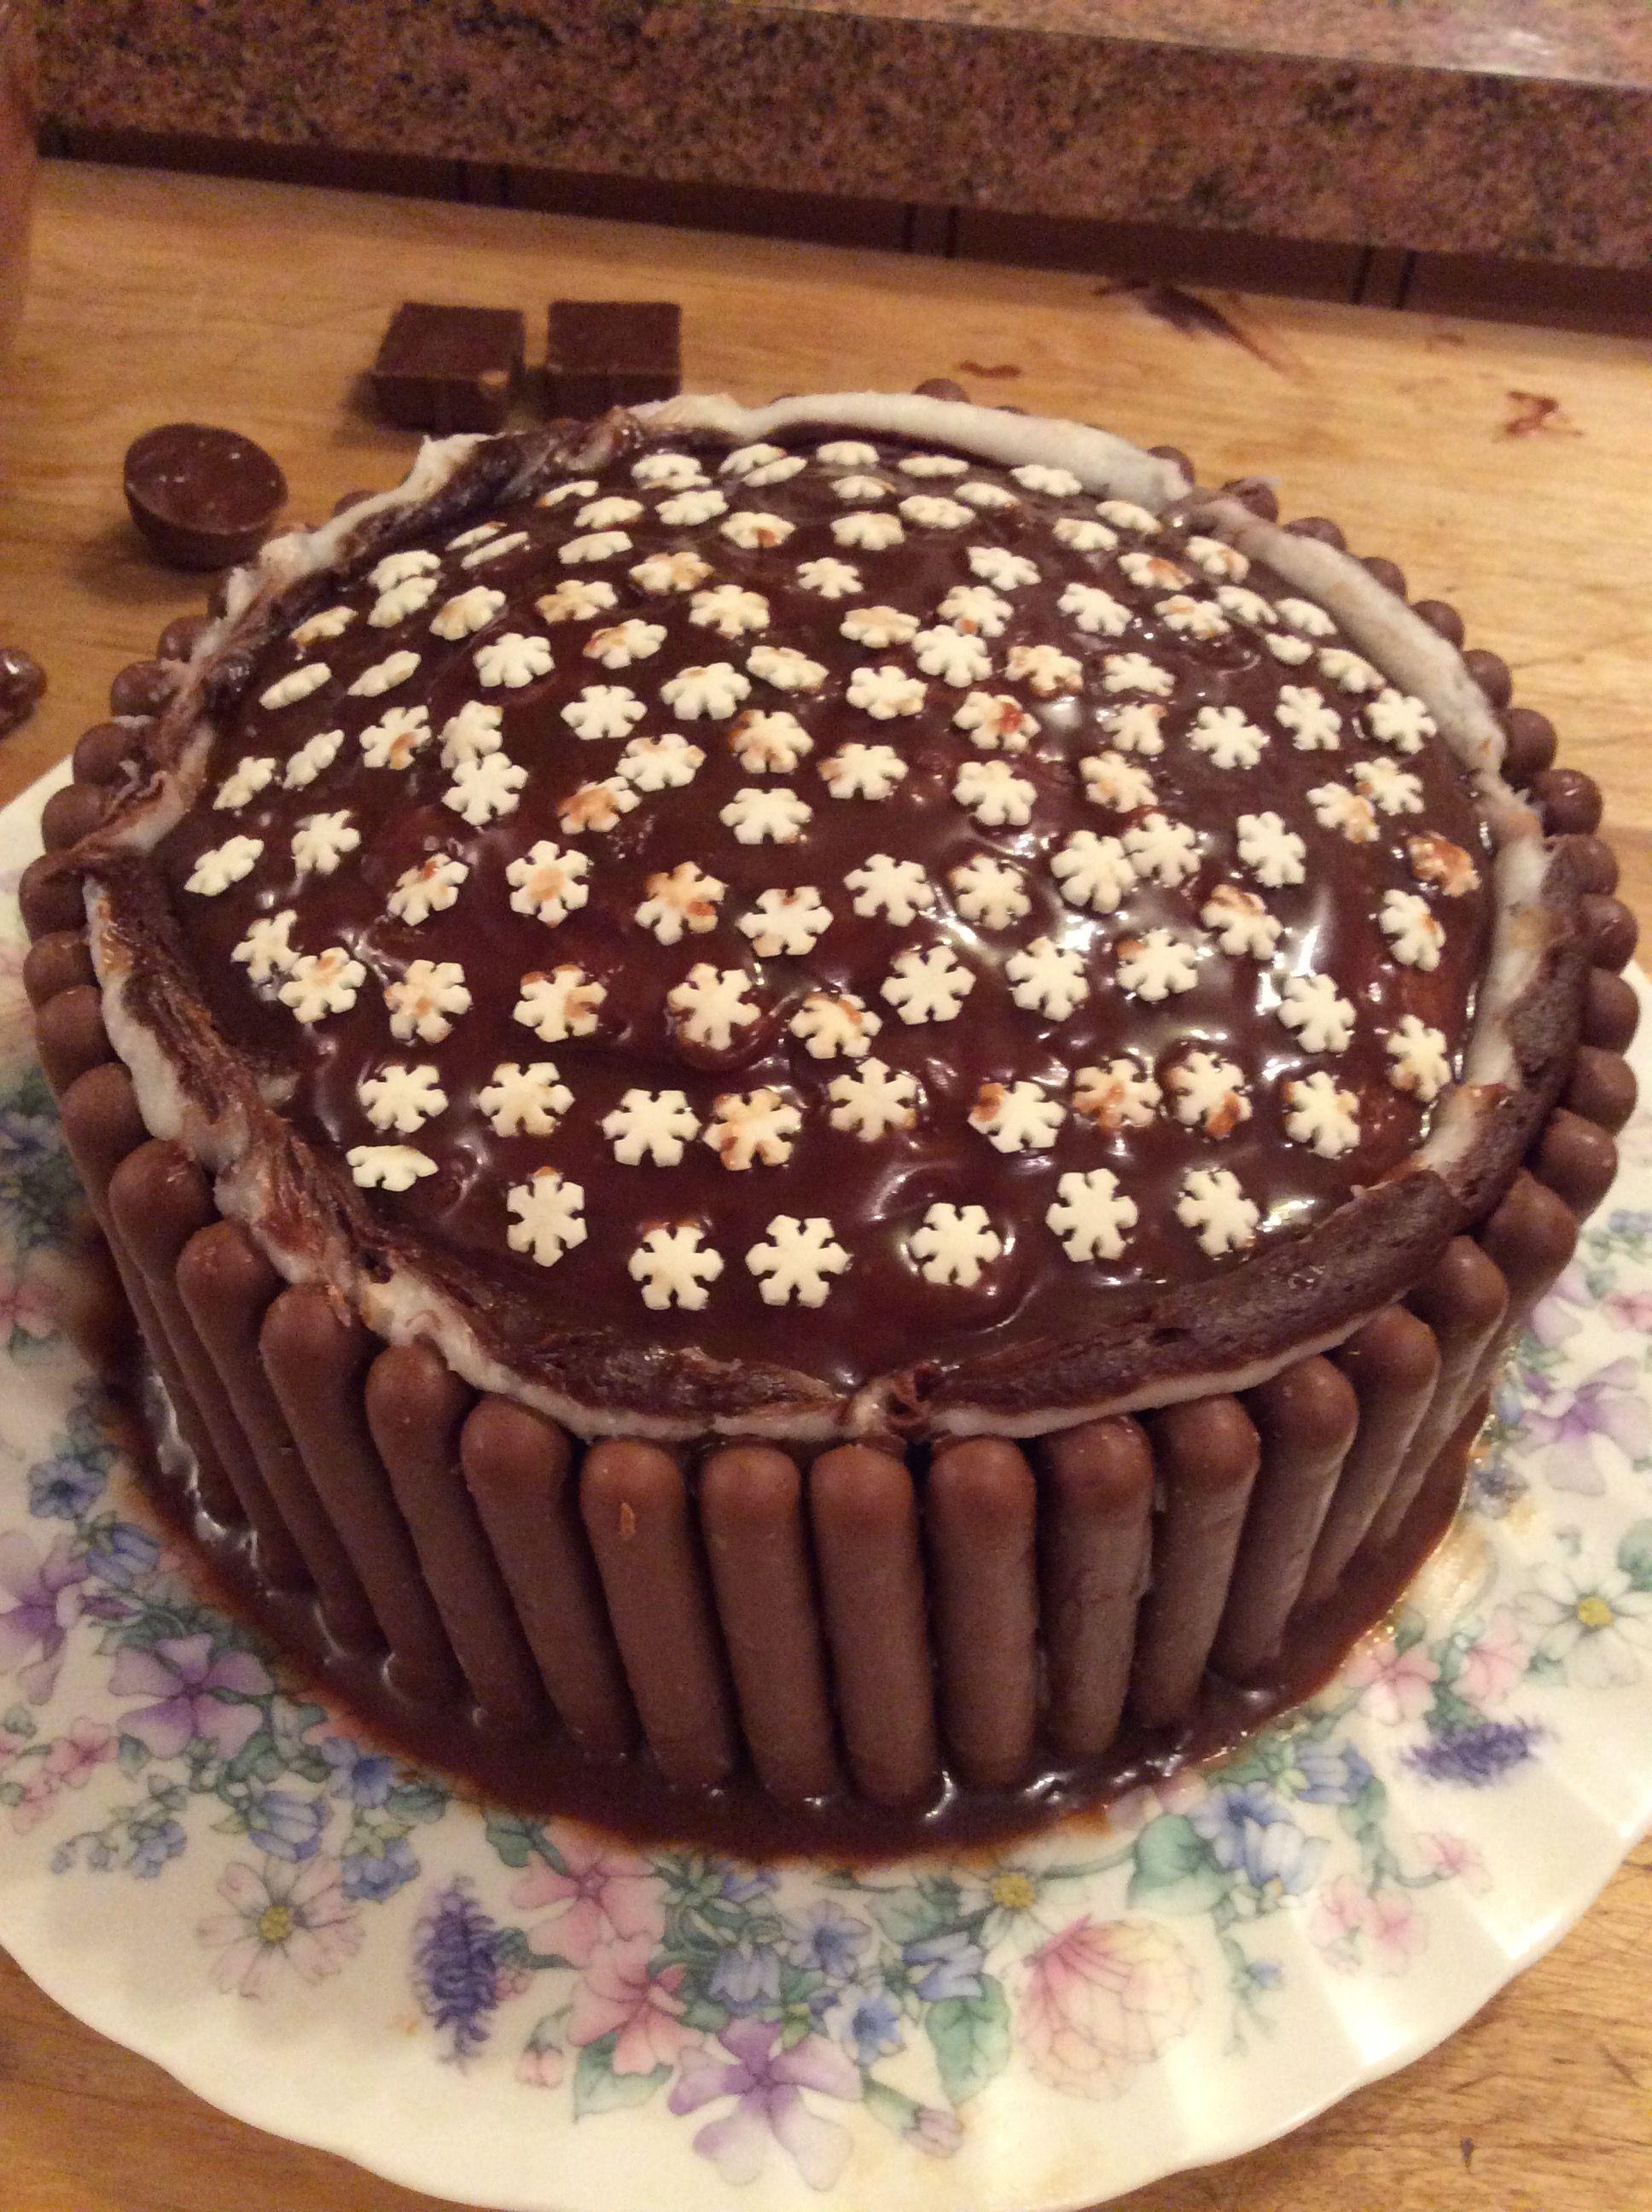 Most with chocolate ganache